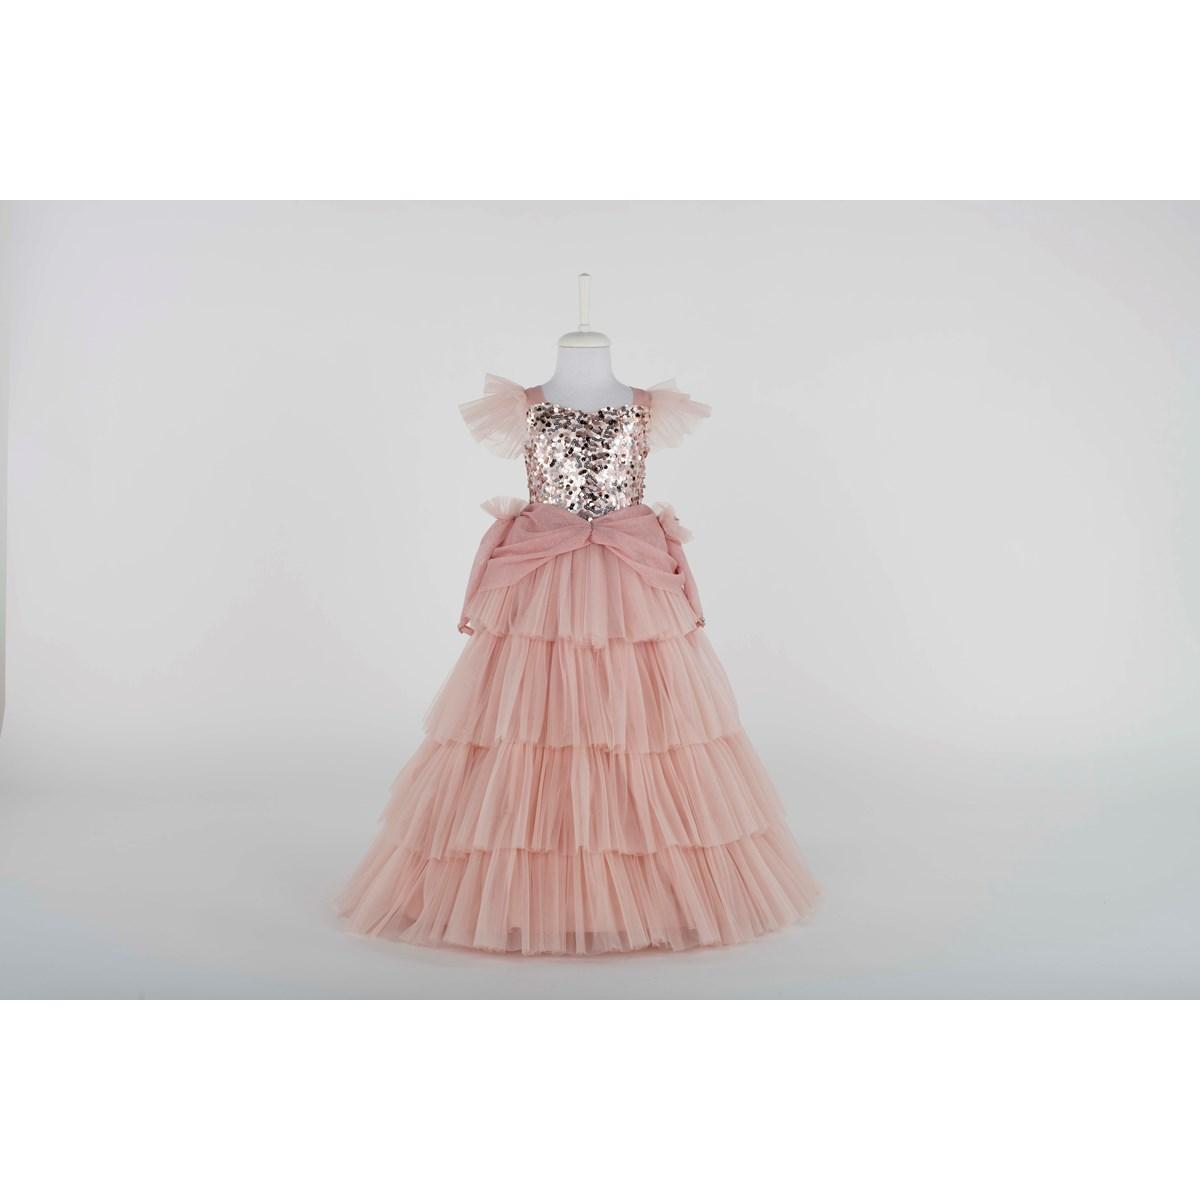 9464 Prenses Kostüm 2